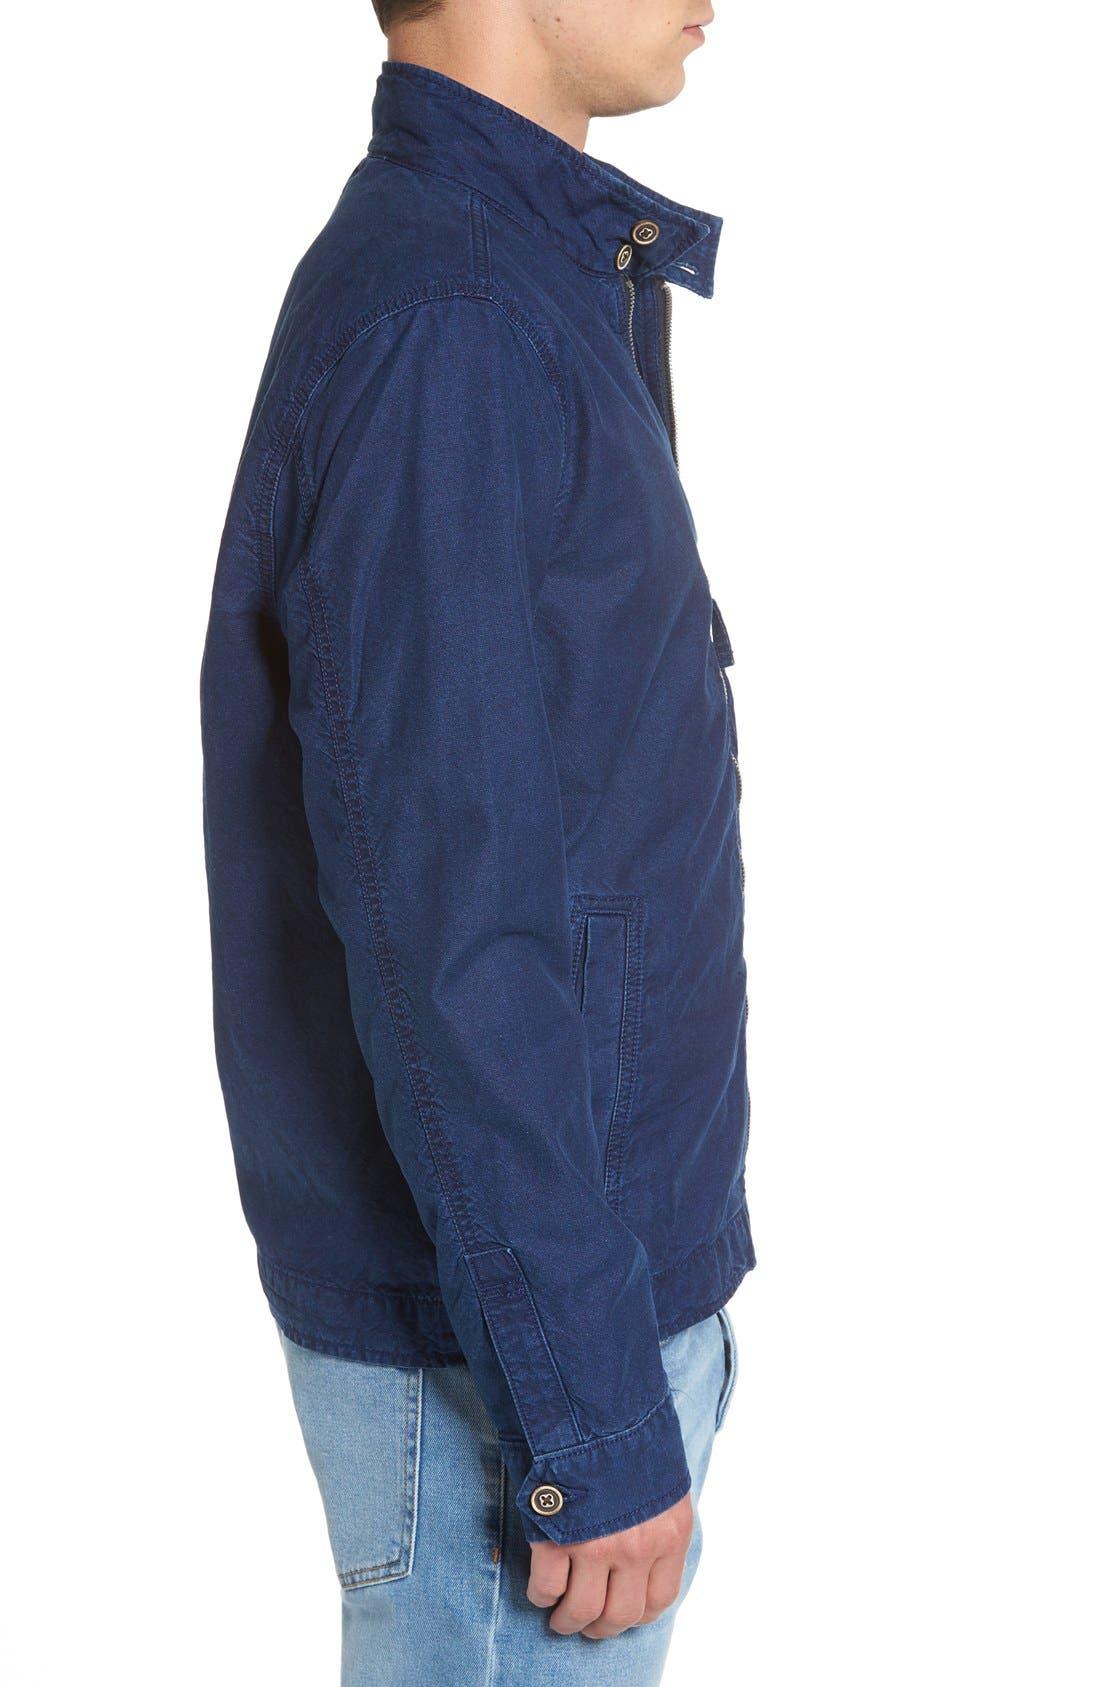 LUCKY BRAND,                             Denim Harrington Jacket,                             Alternate thumbnail 3, color,                             410